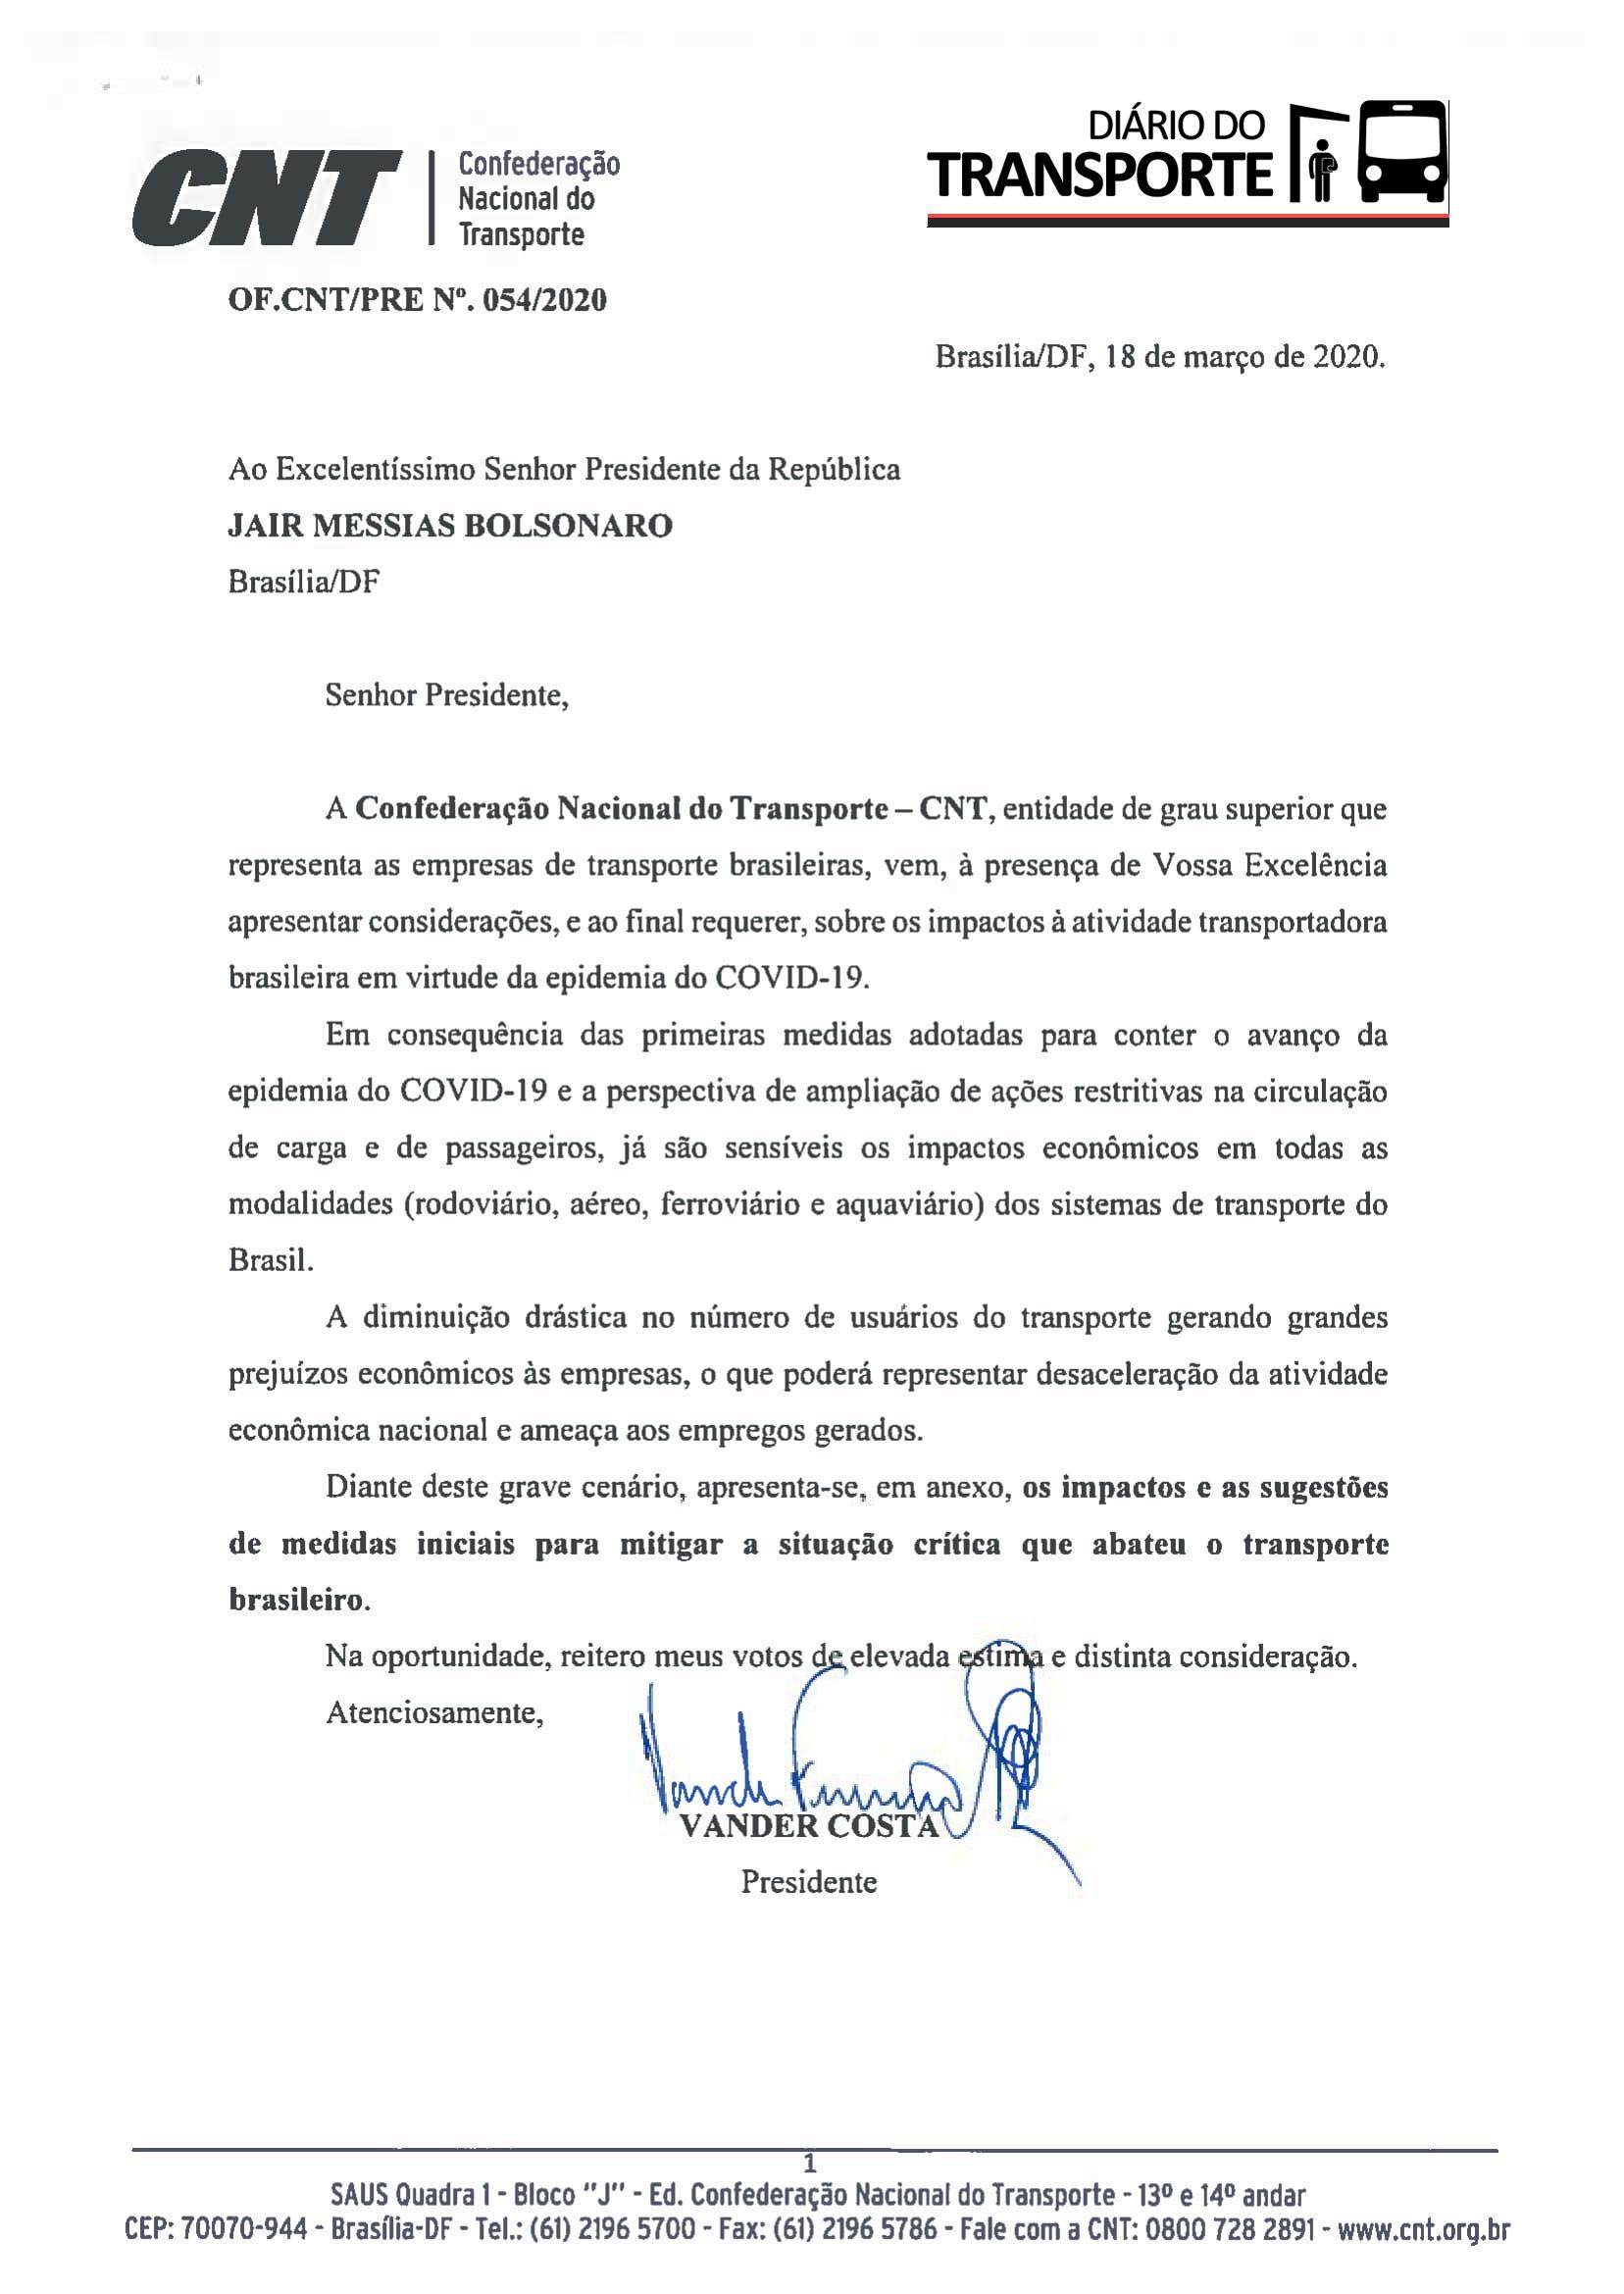 OF. CNT PRE N 054_2020.pdf-1